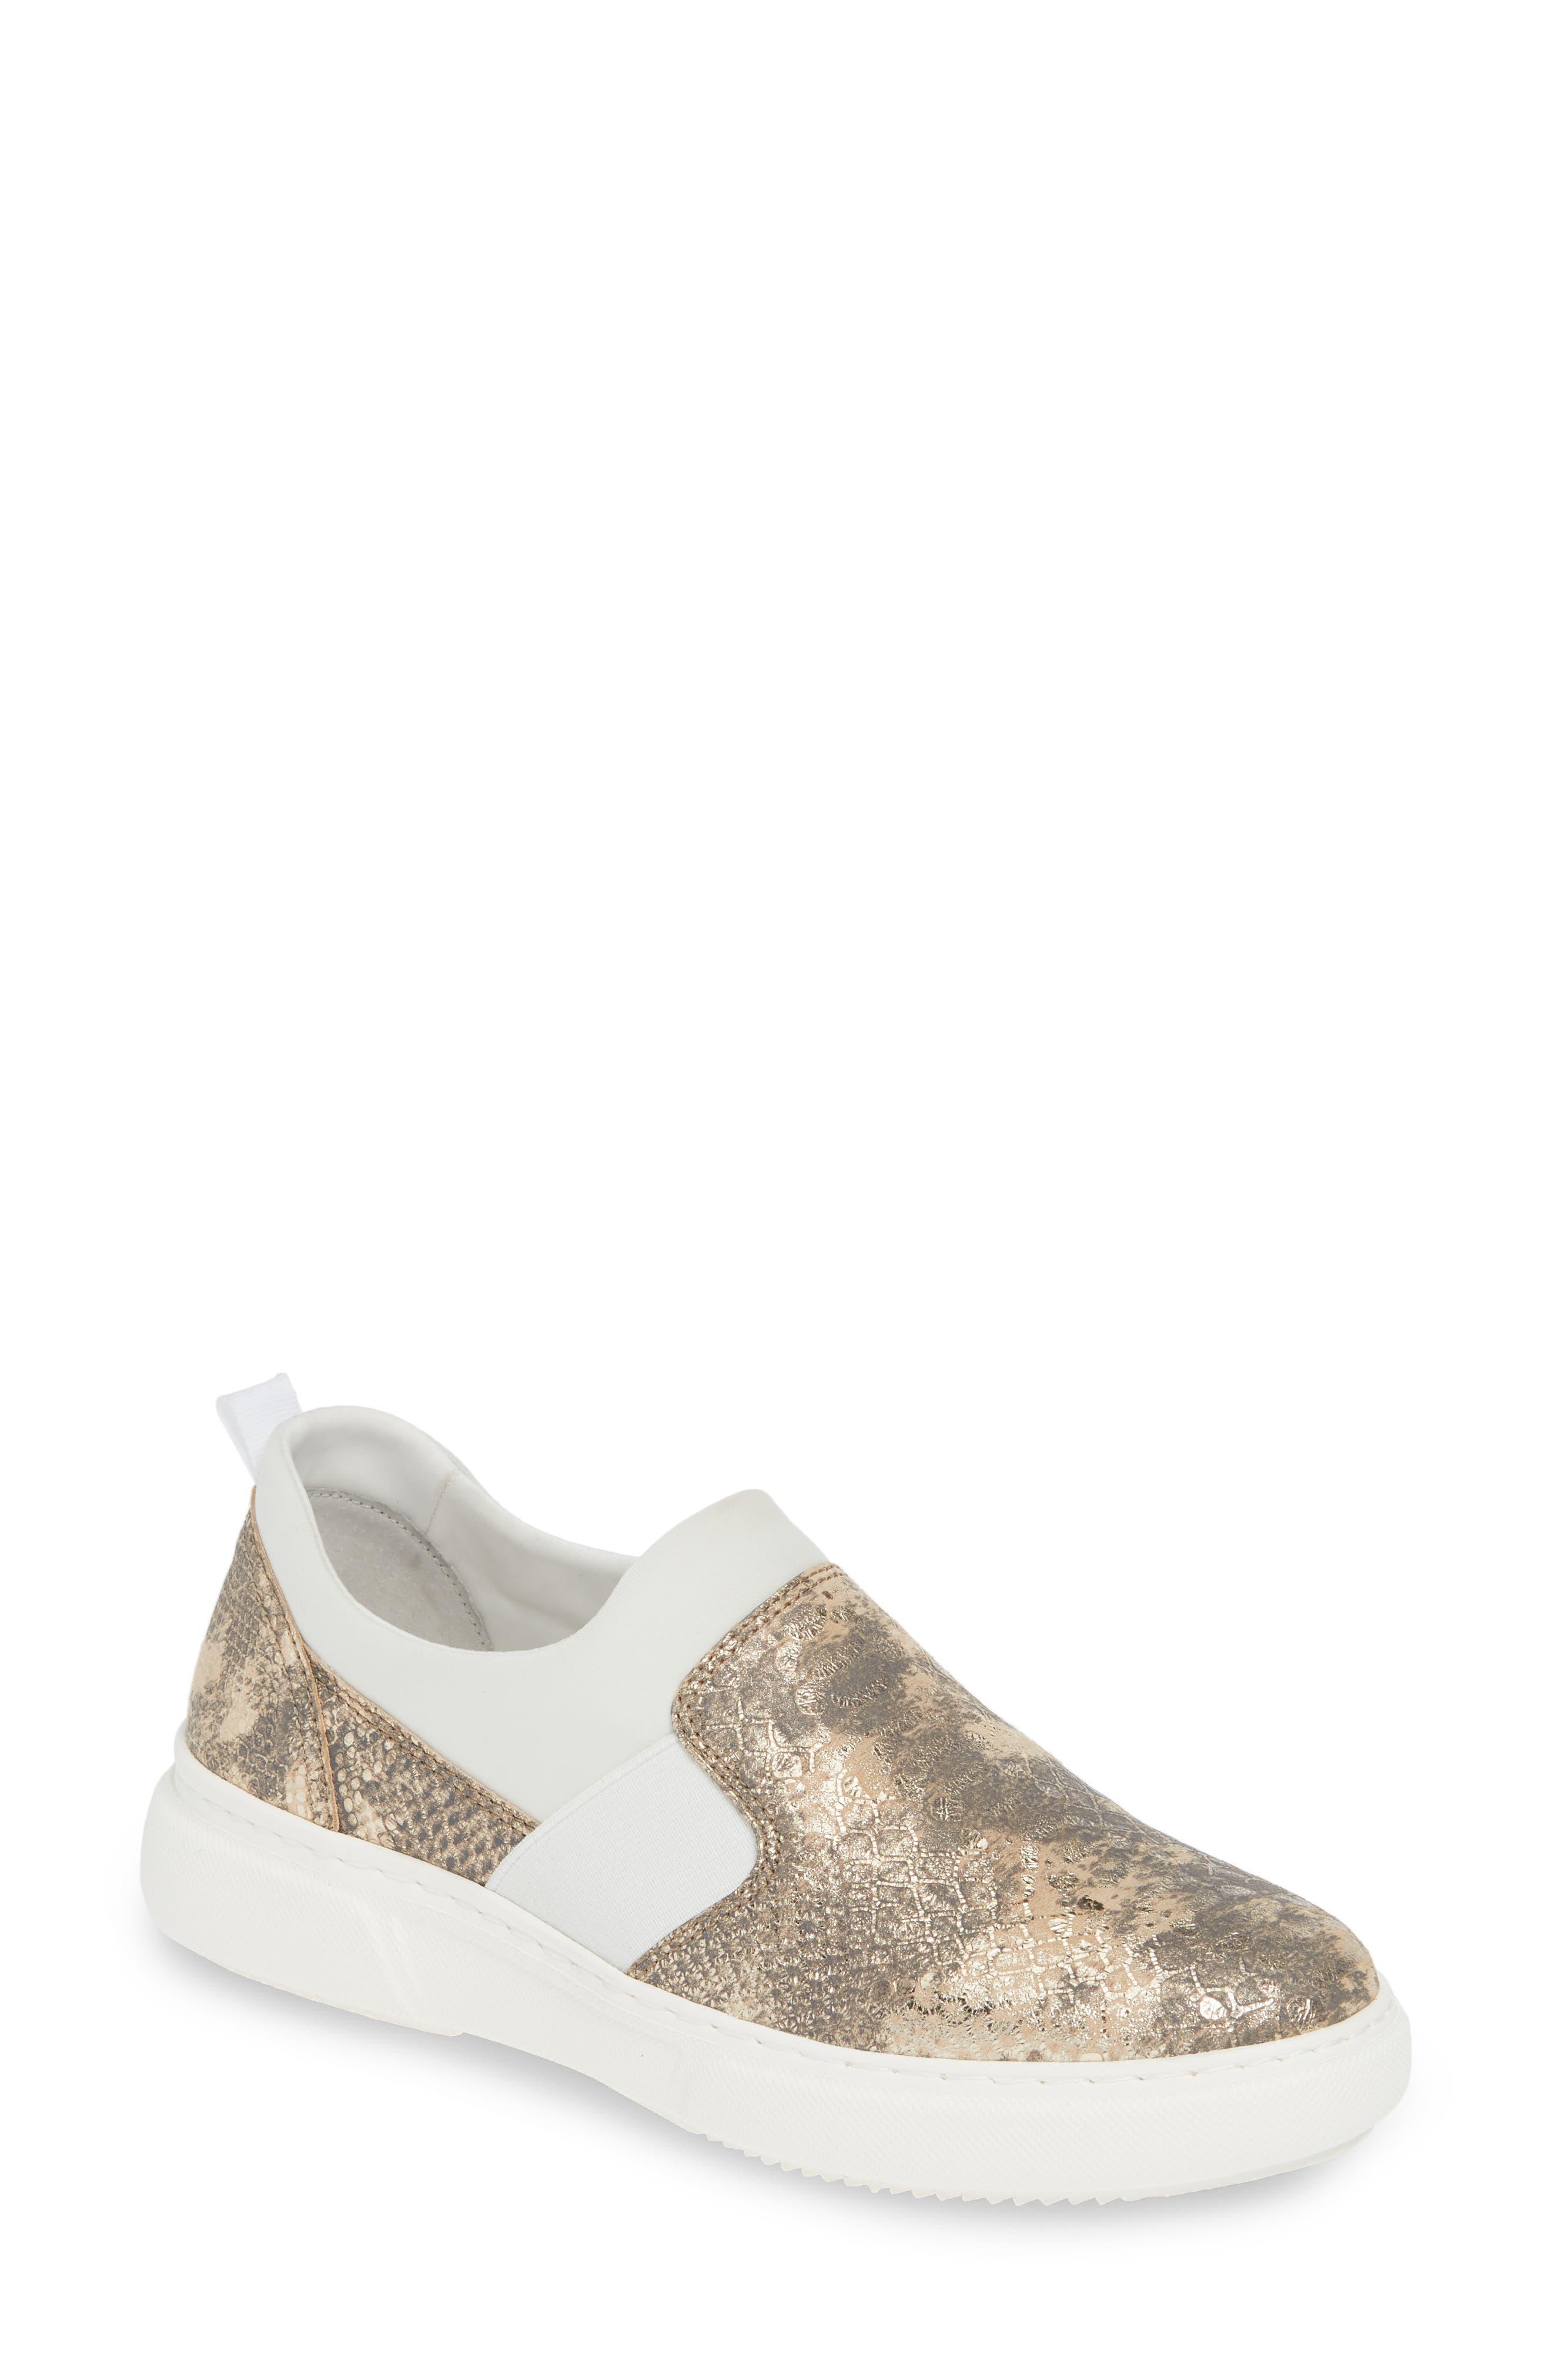 Johnston & Murphy Noelle Slip-On Sneaker, Metallic